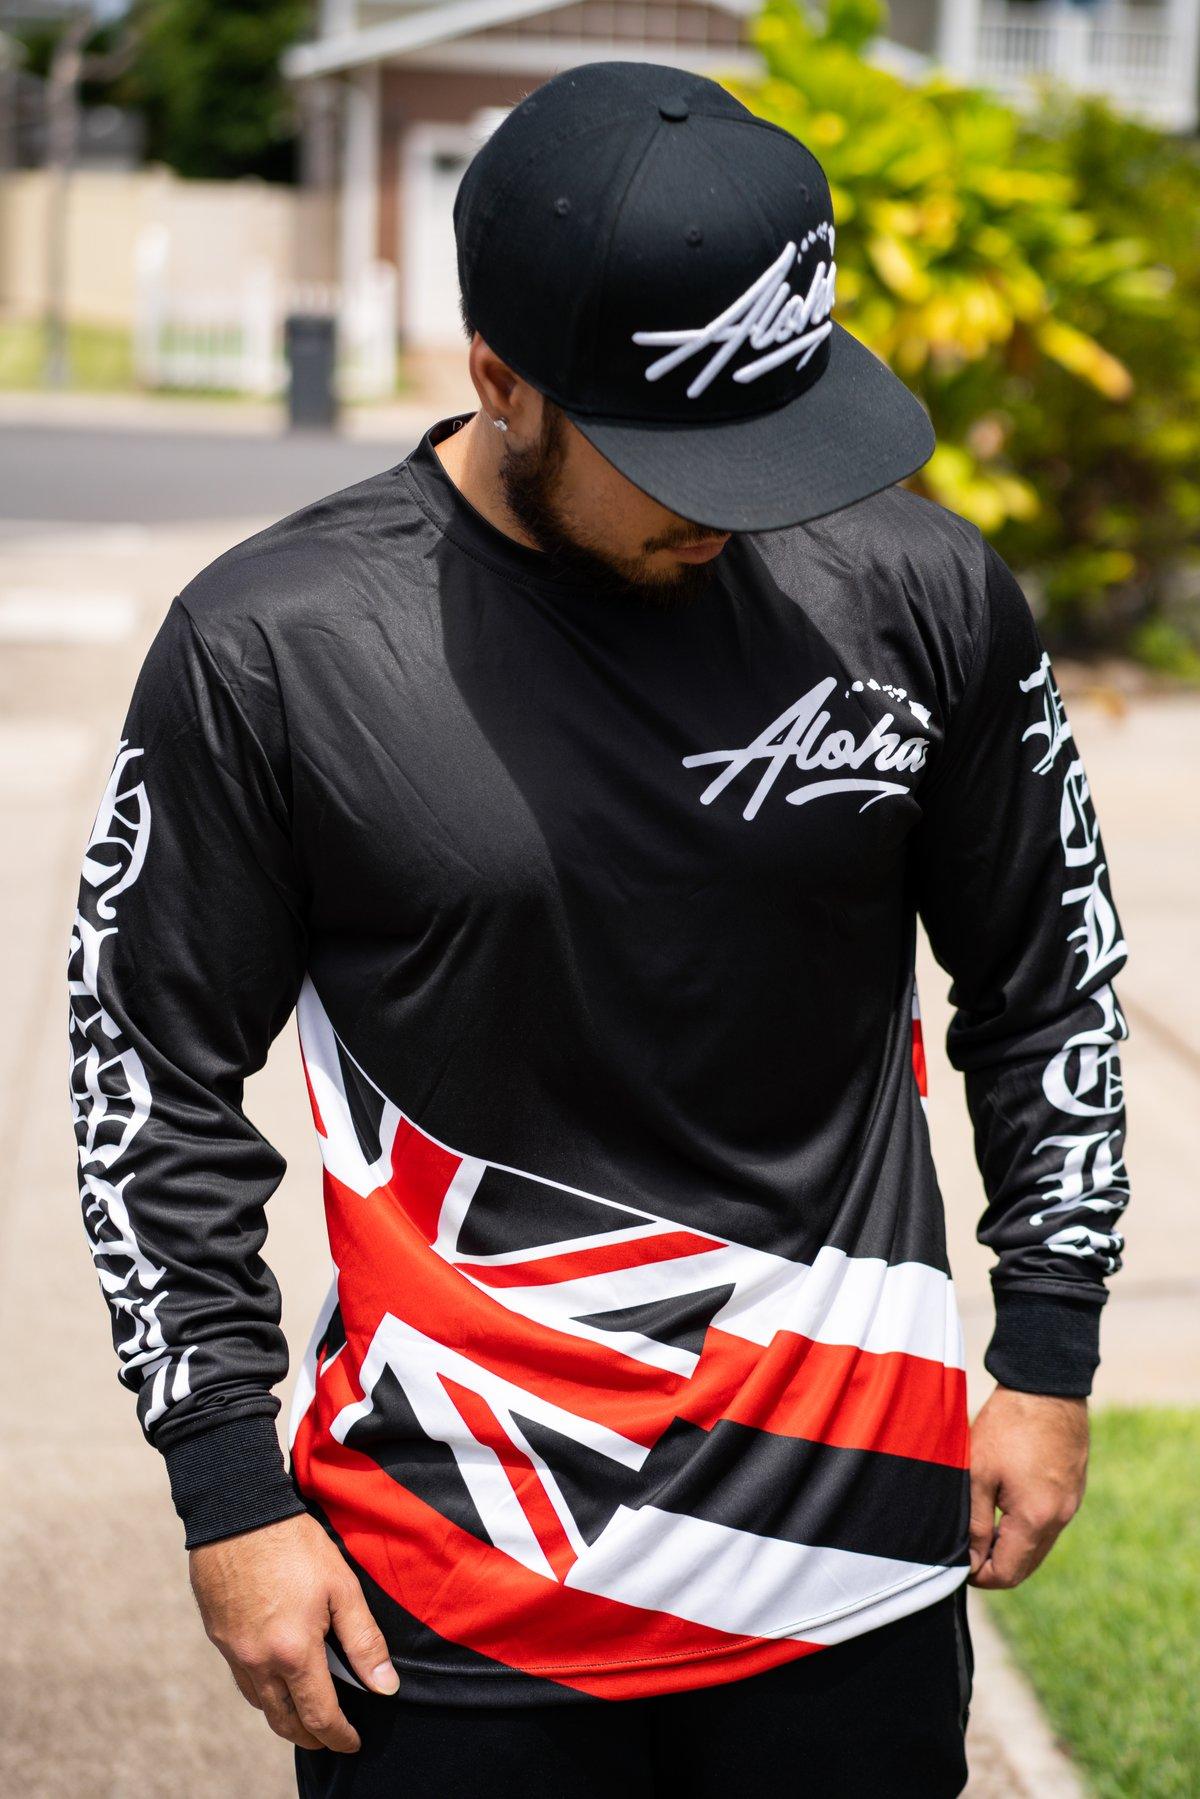 Aloha Islands Half-Flag Longsleeve (Red White Black)